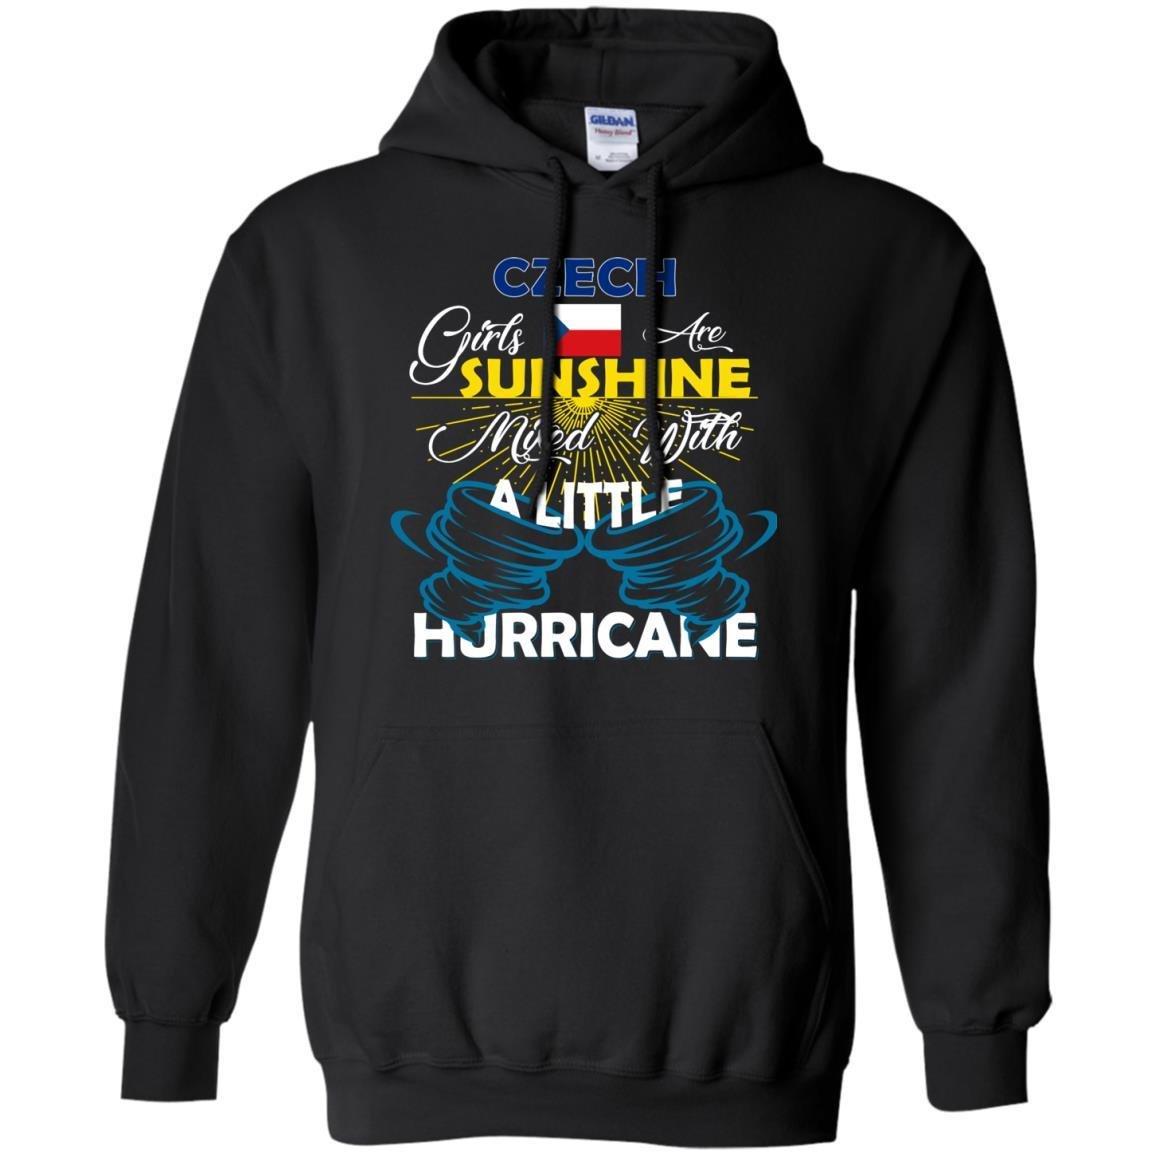 FavoryStore Czech Girls Are Sunshine Mixed With a Little Hurricane Shirt Hoodie